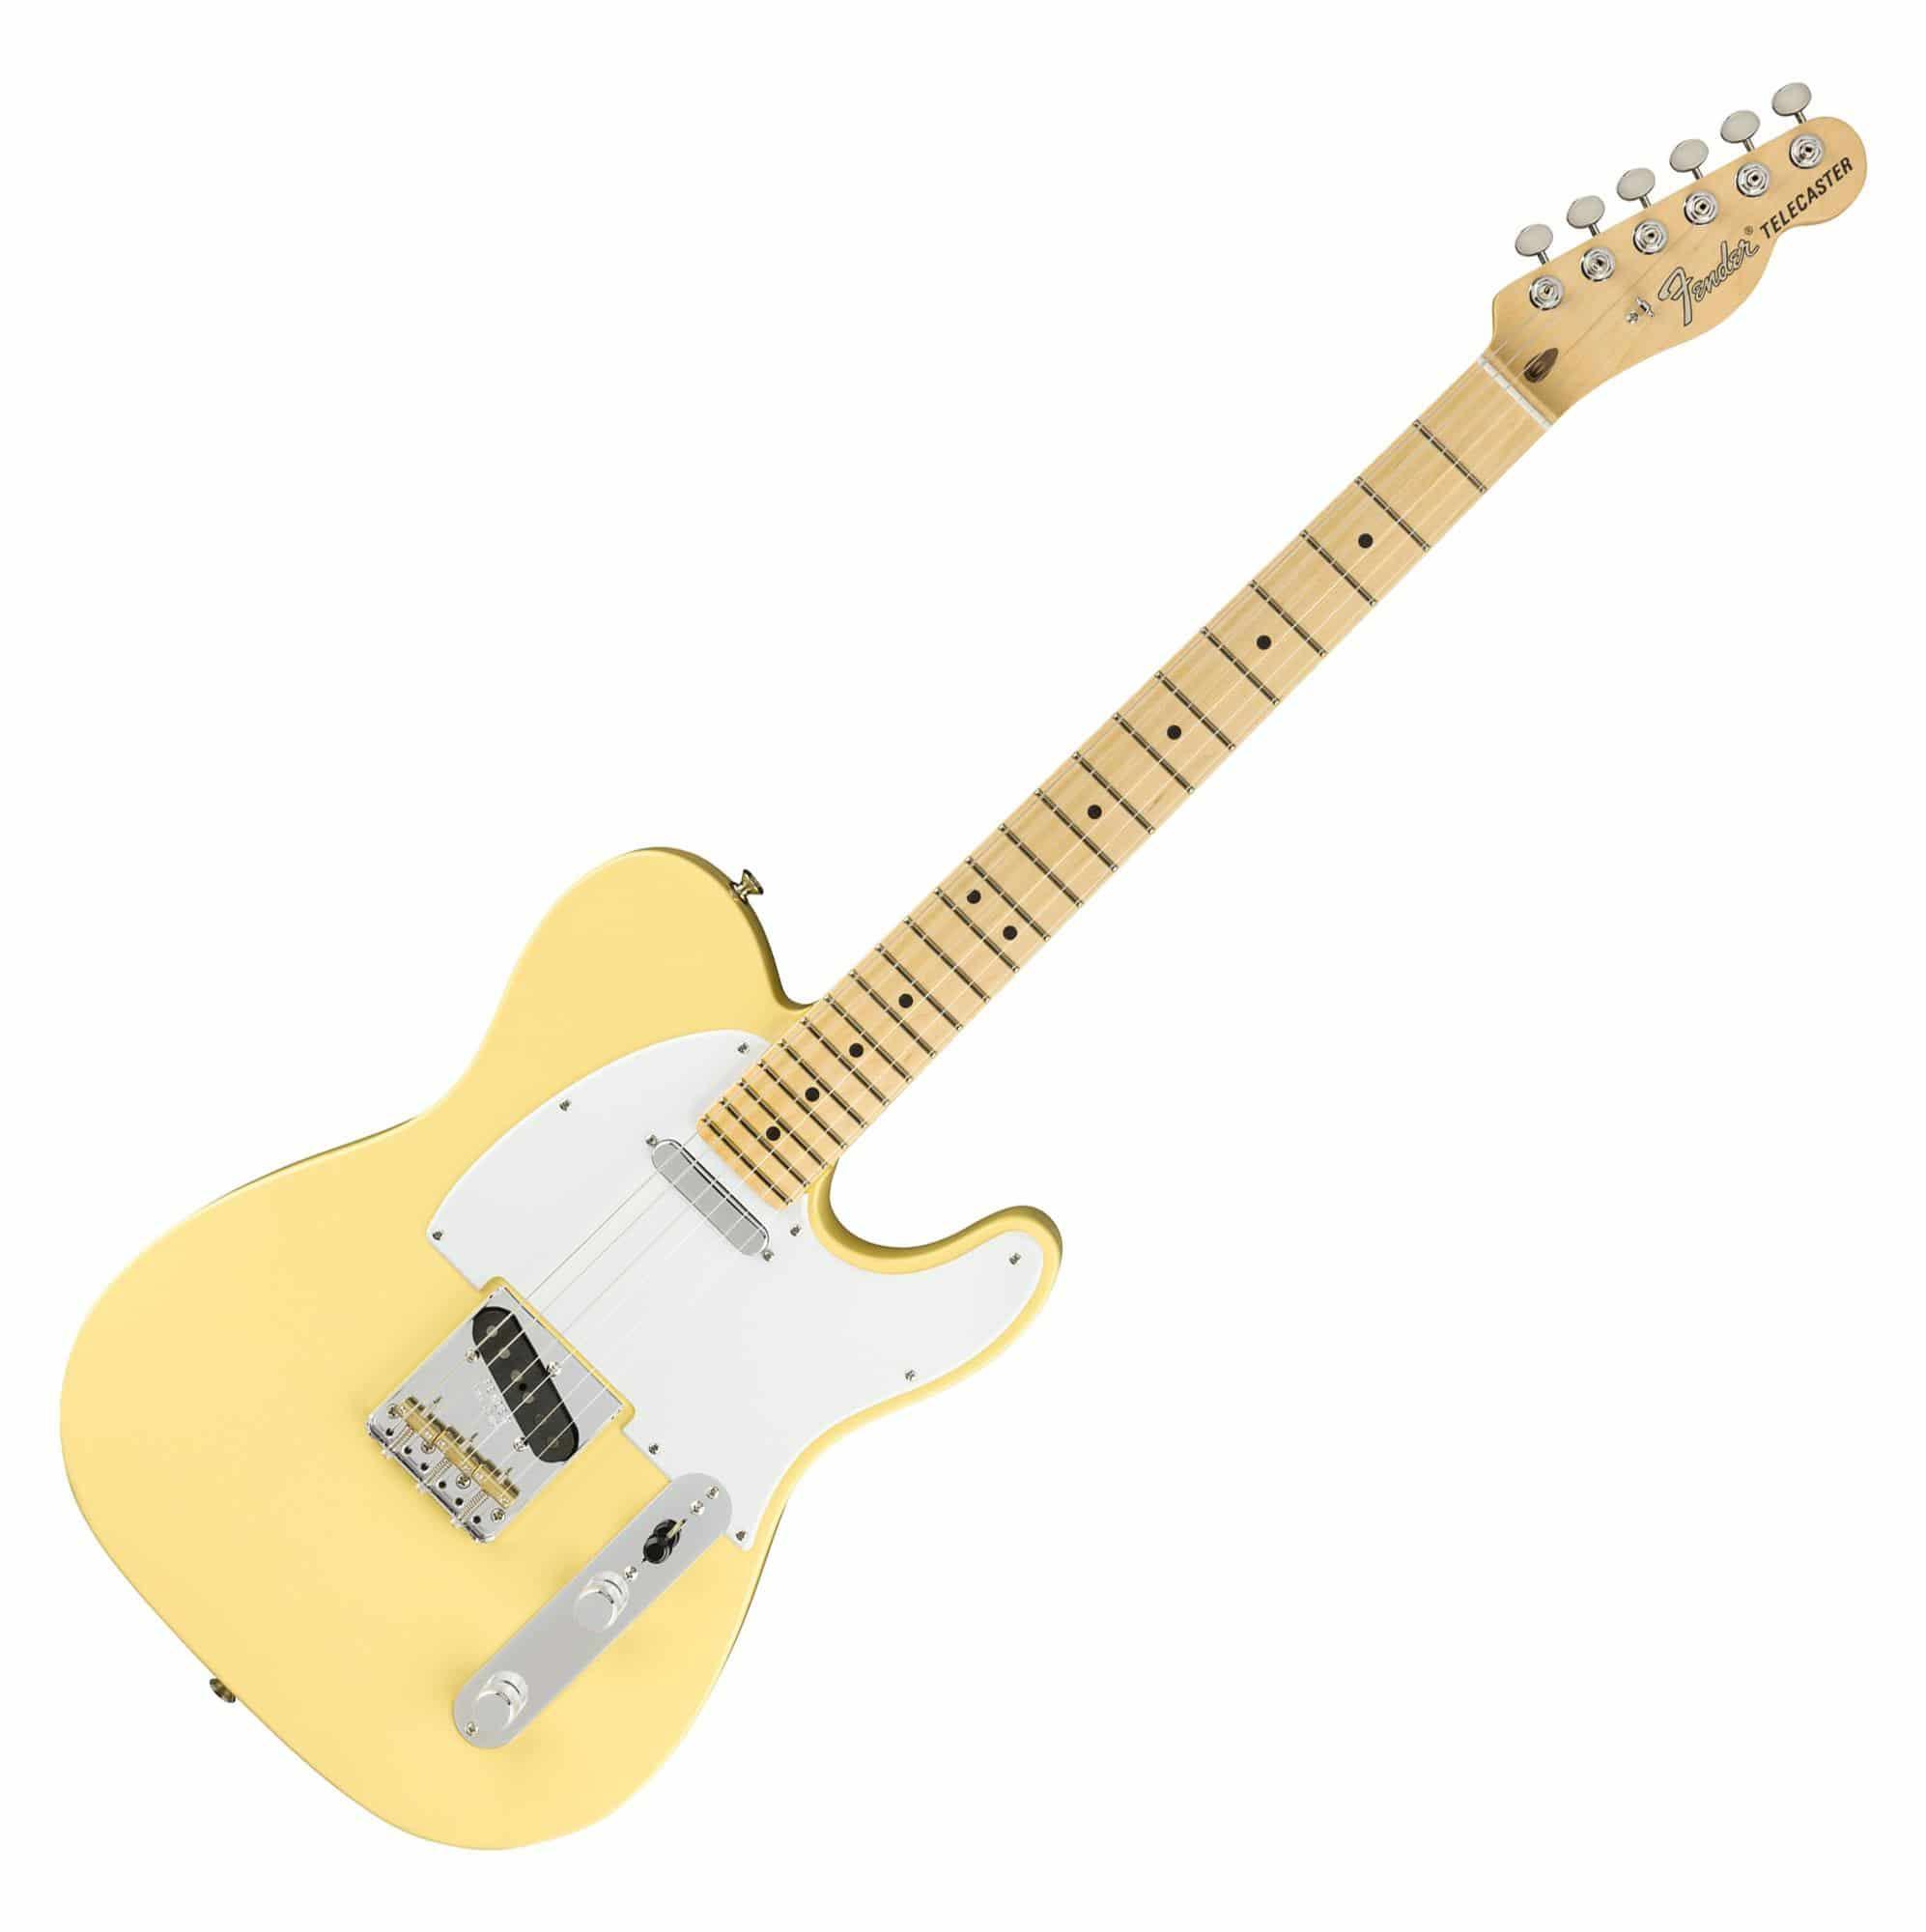 Egitarren - Fender American Performer Tele MN VWT - Onlineshop Musikhaus Kirstein